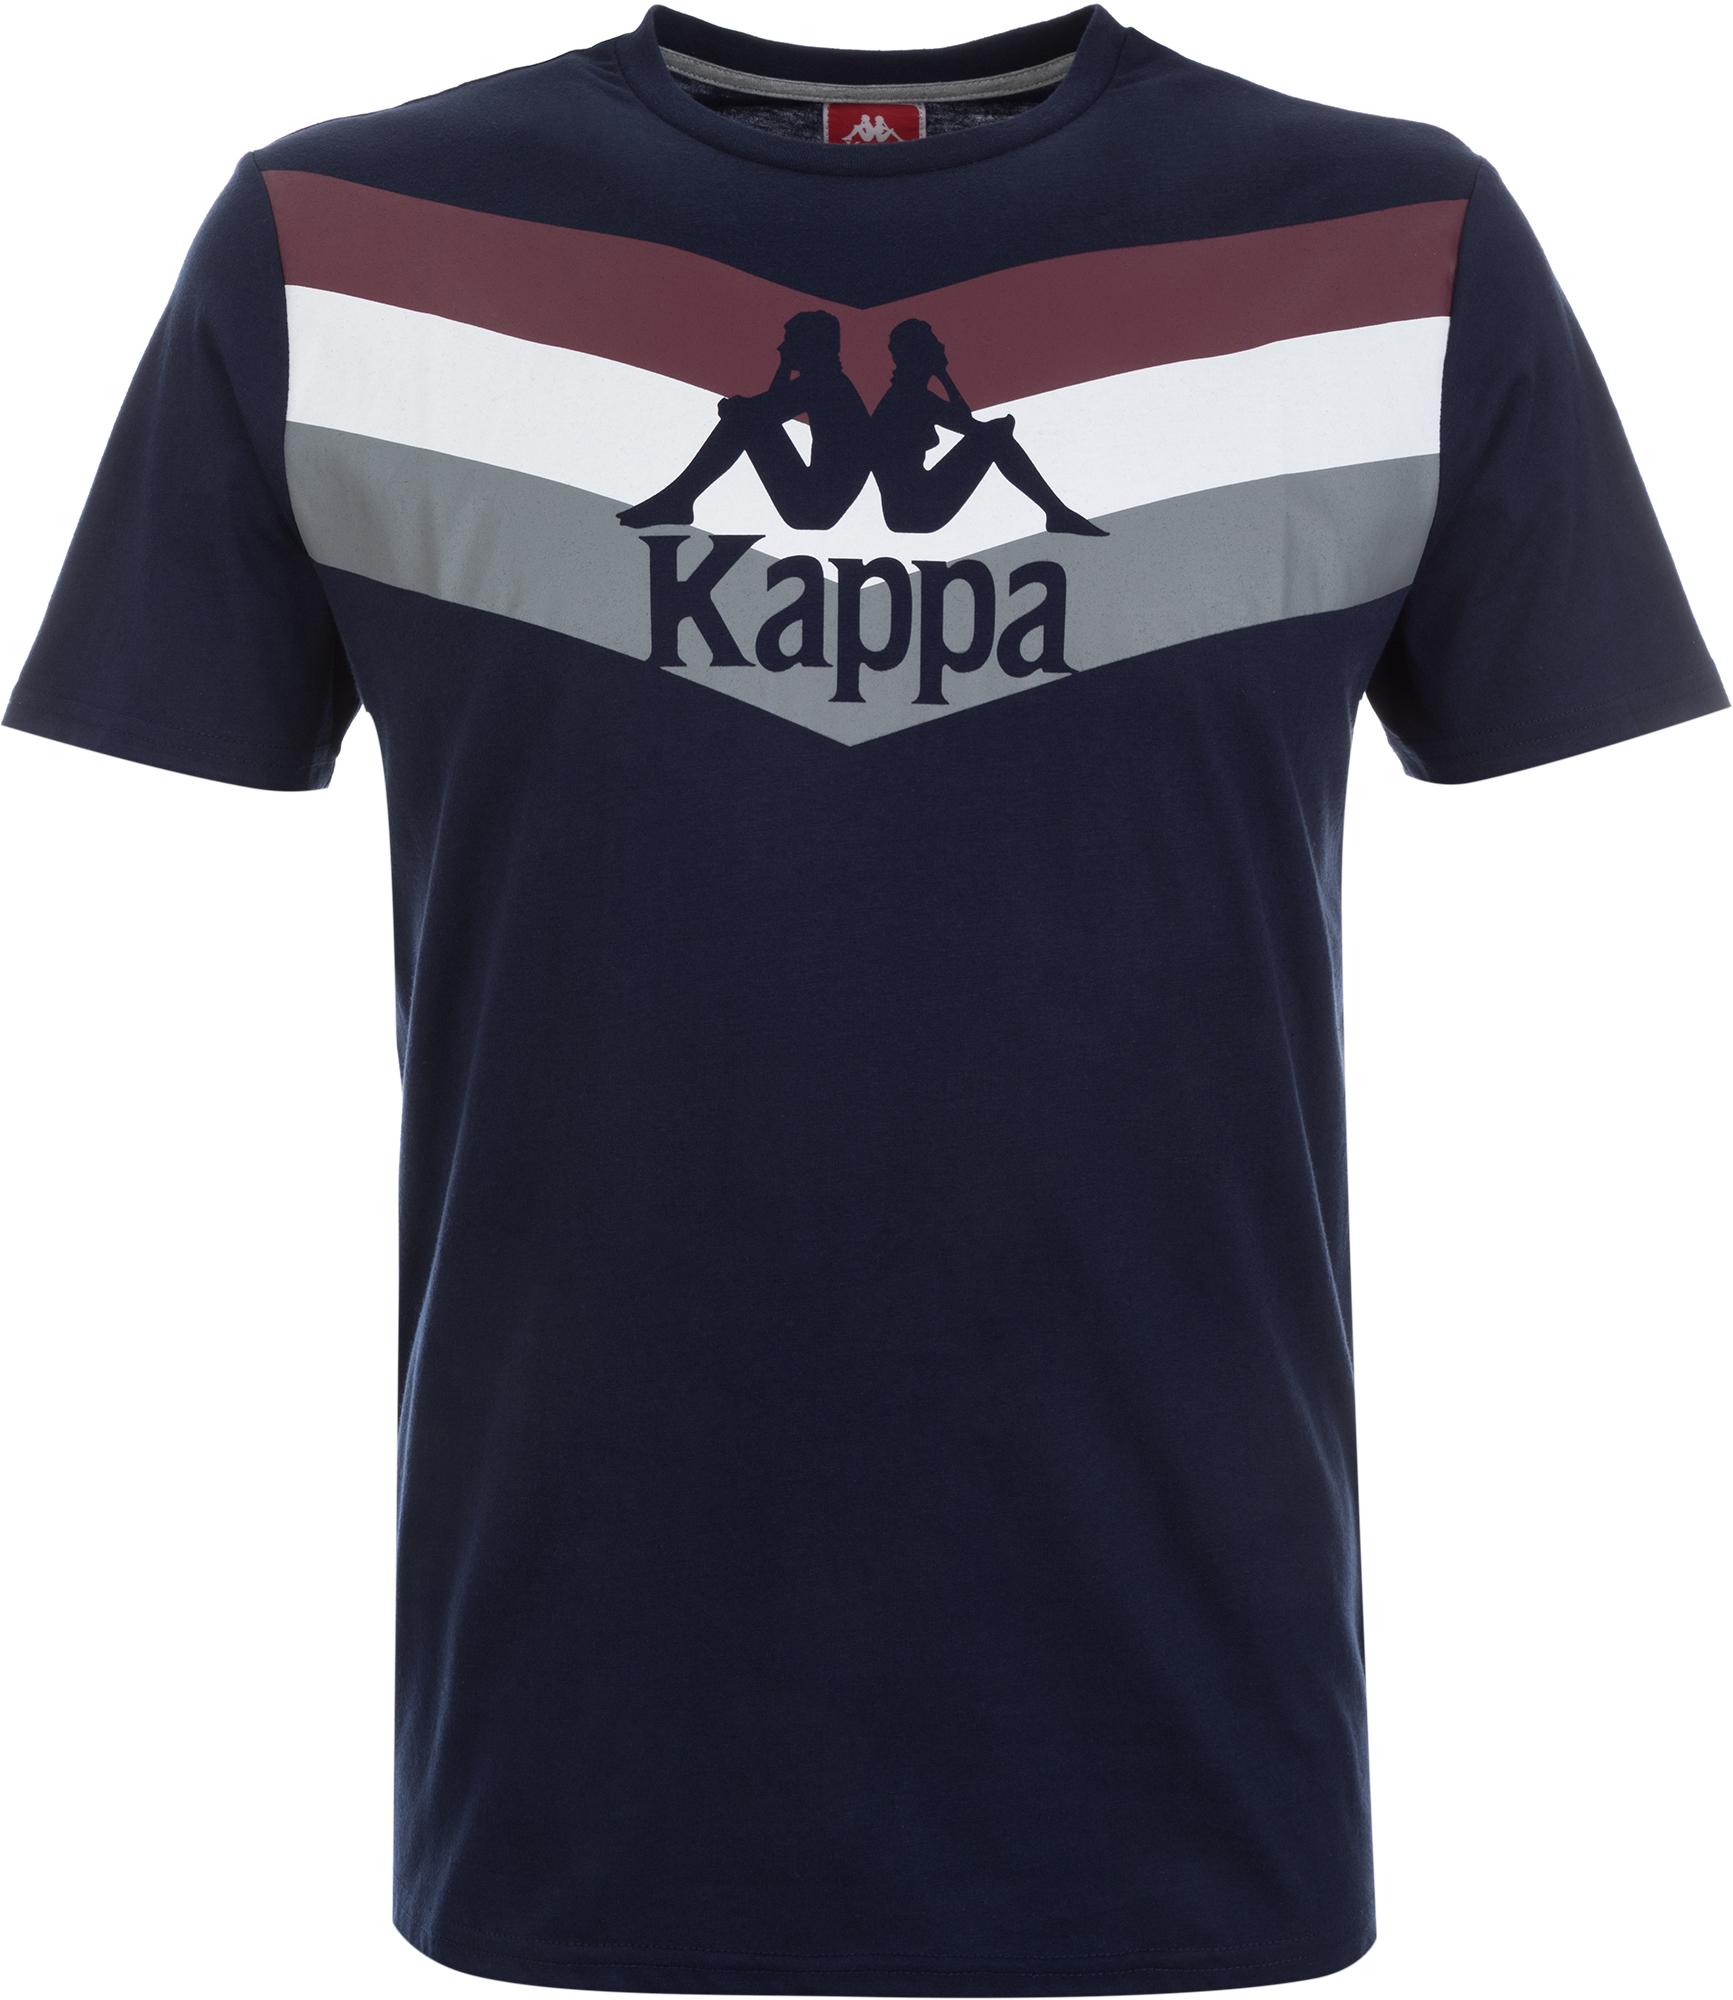 Kappa Футболка мужская Kappa, размер 56 kappa kappa kp 1411l f